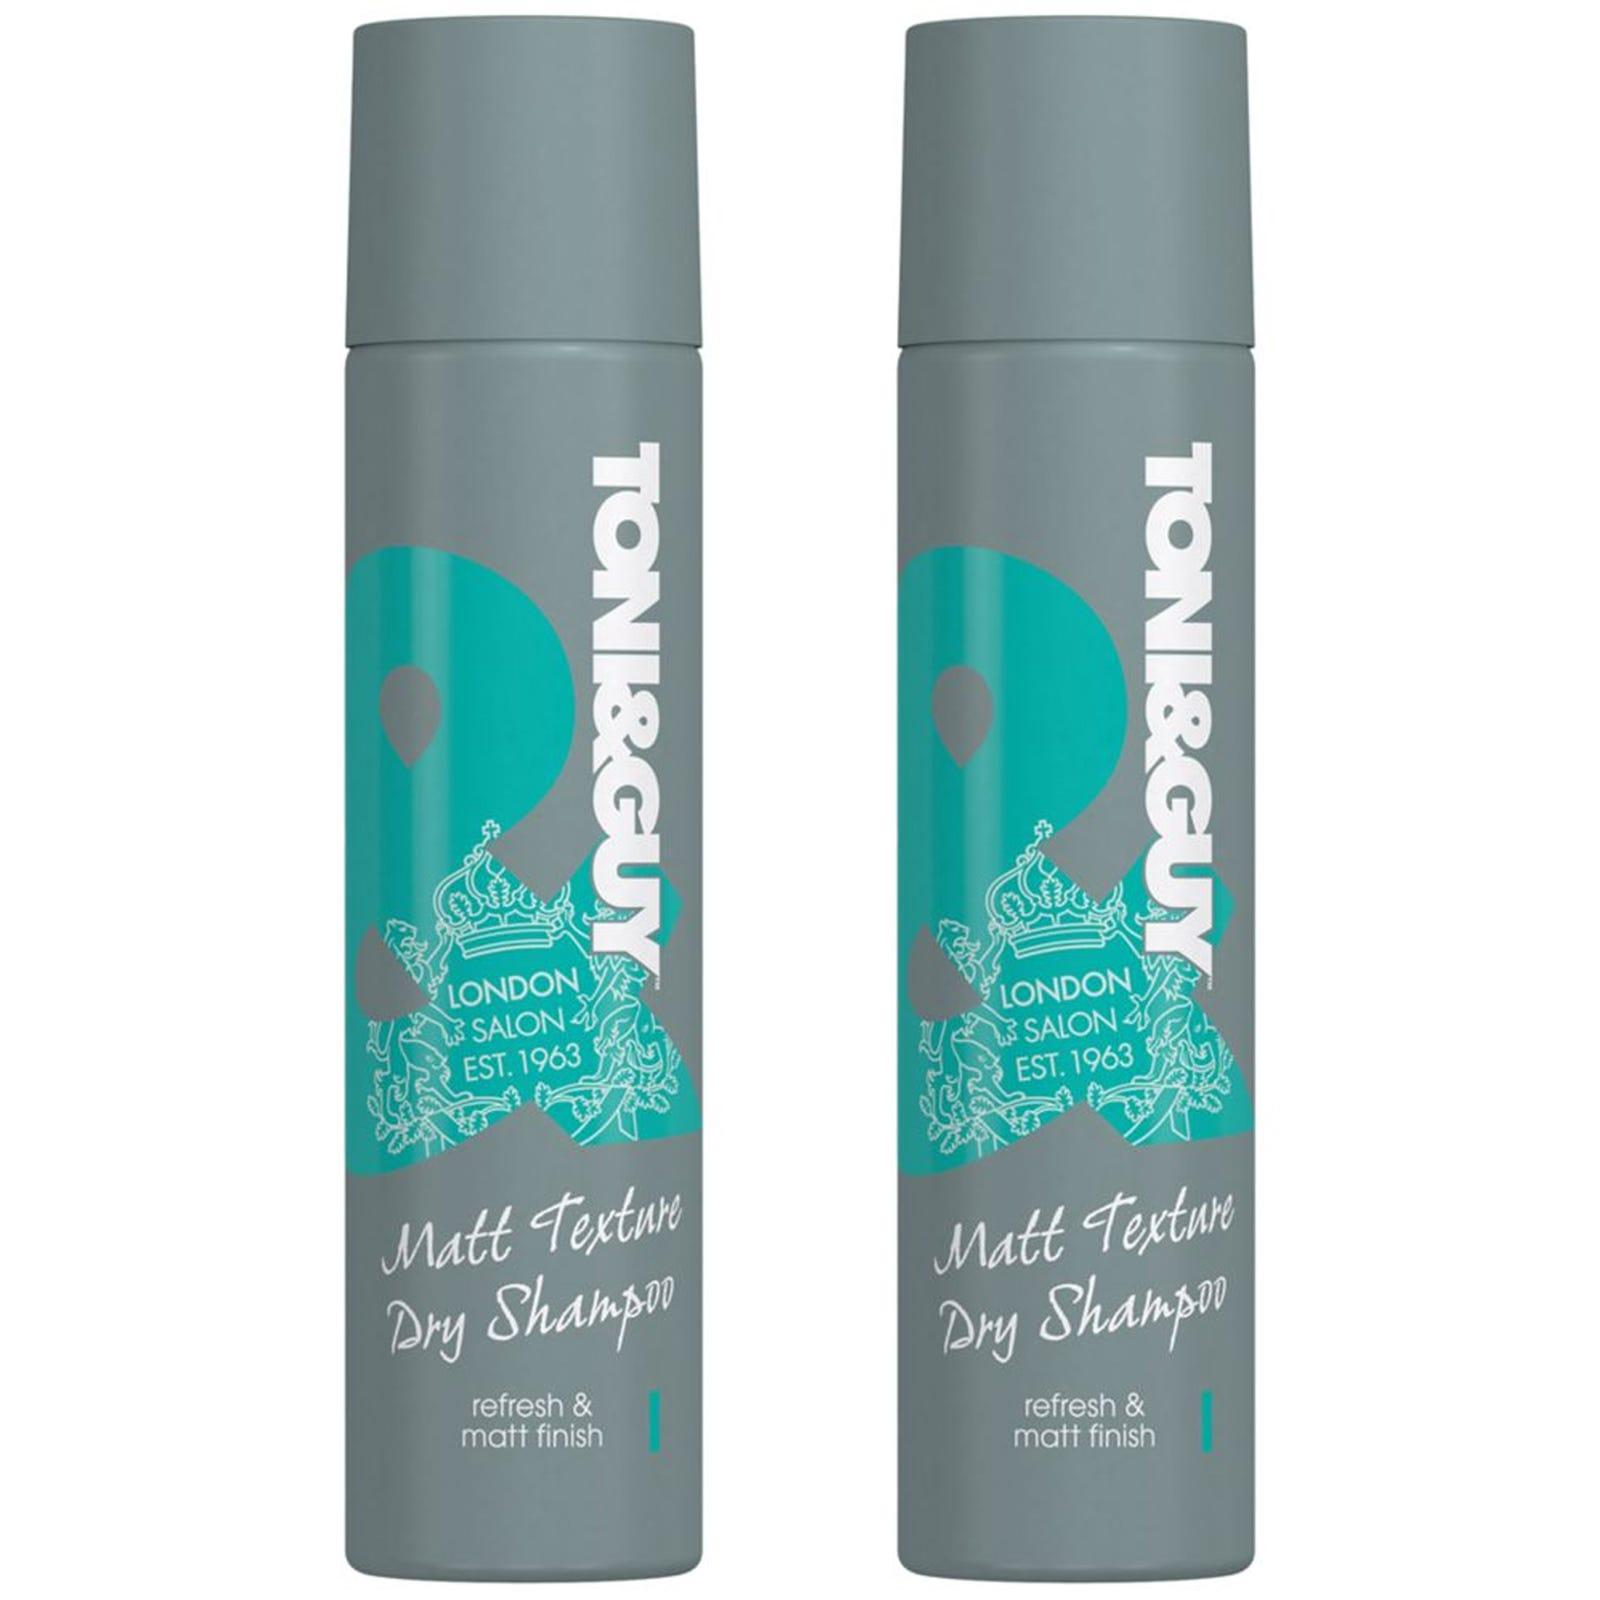 2x Toni & Guy Matte Texture Dry Shampoo